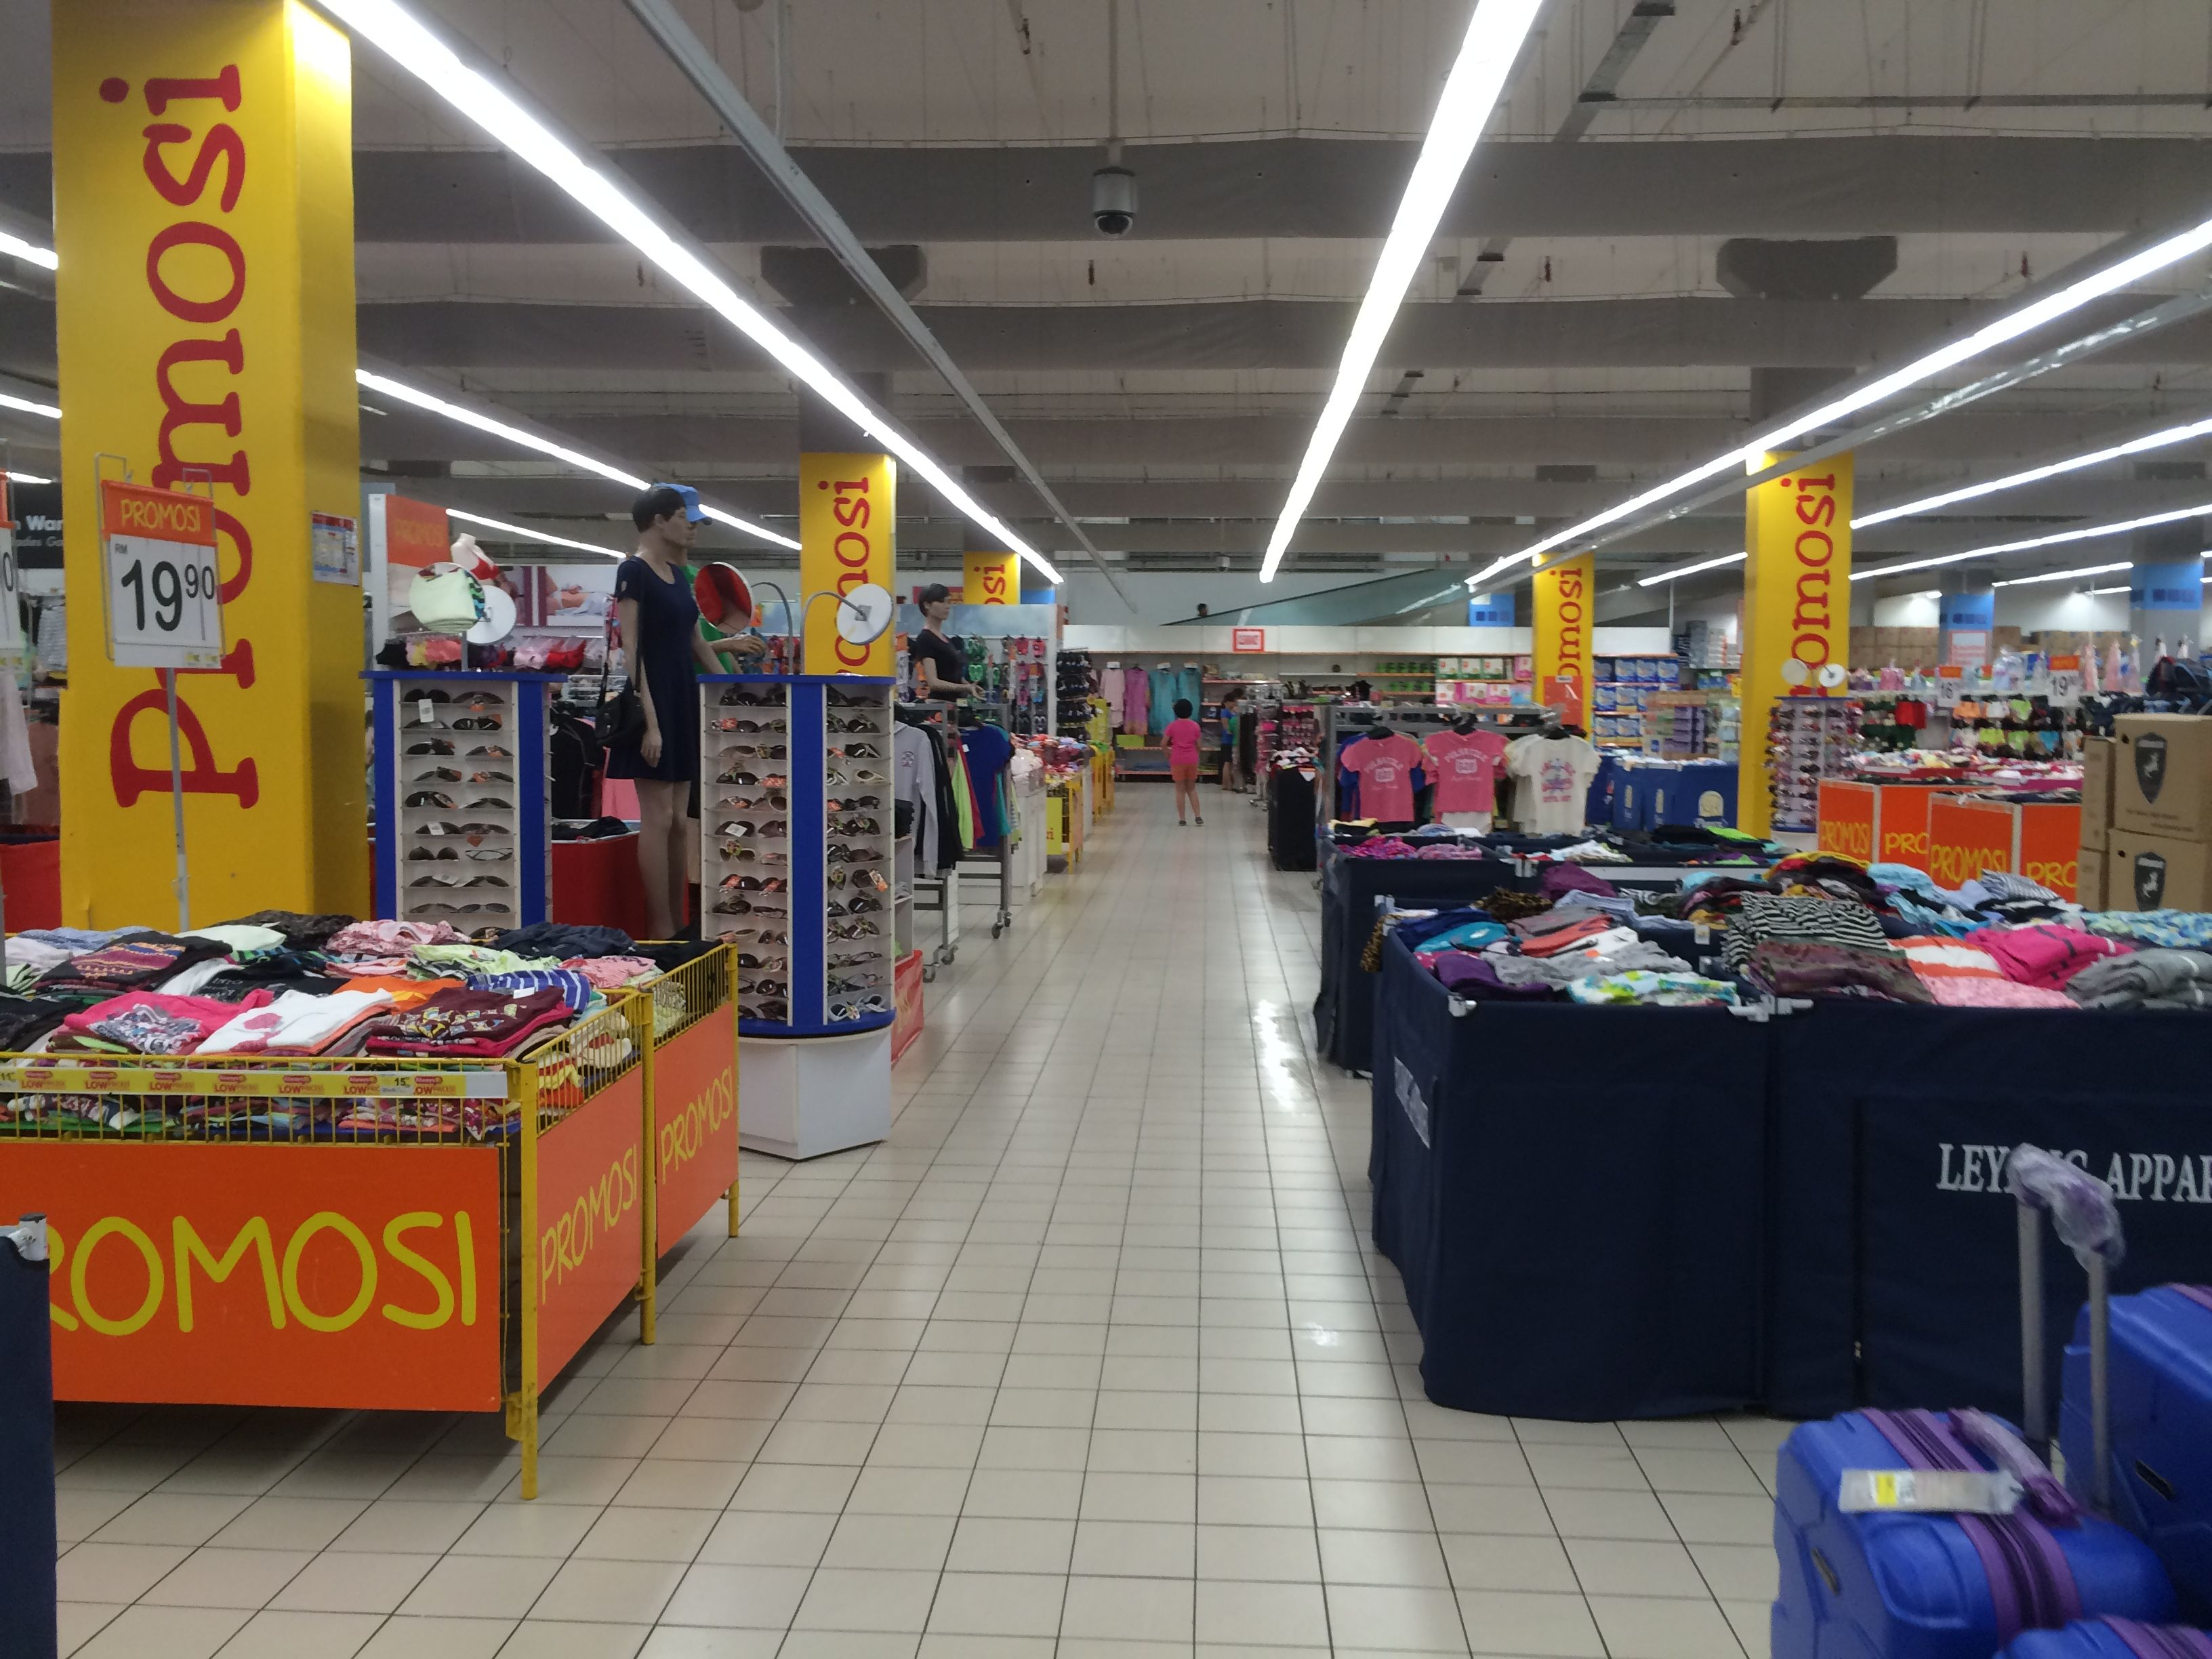 Aeon Big Johor Bahru Malaysia Hypermarket Layout